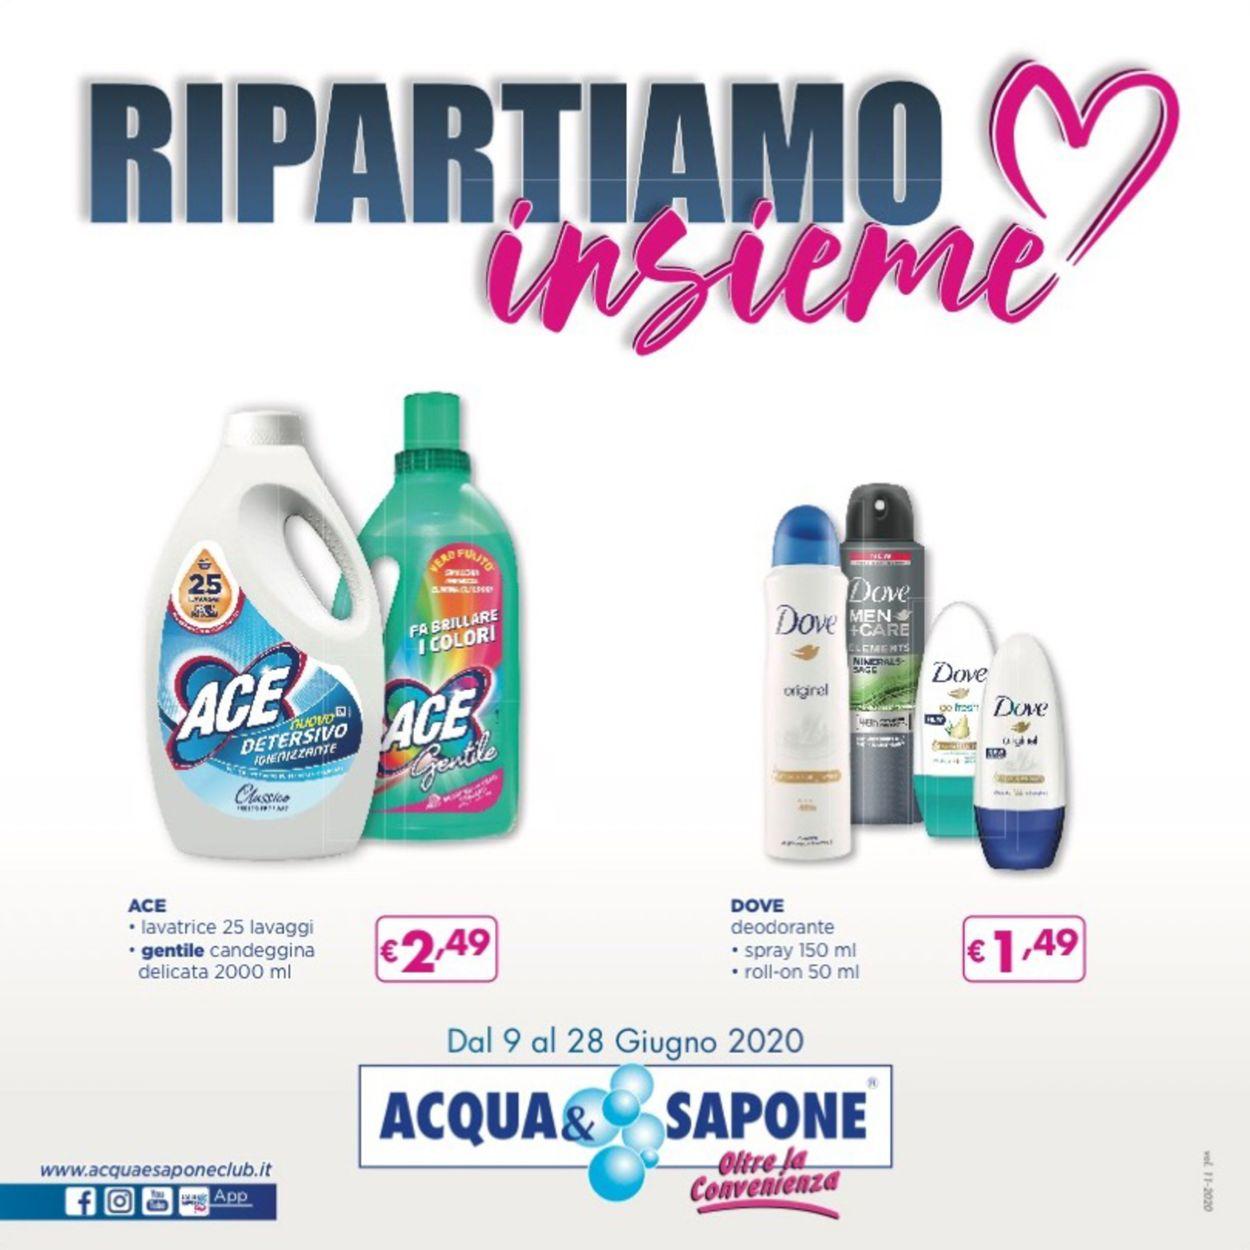 Volantino Acqua & Sapone - Offerte 09/06-28/06/2020